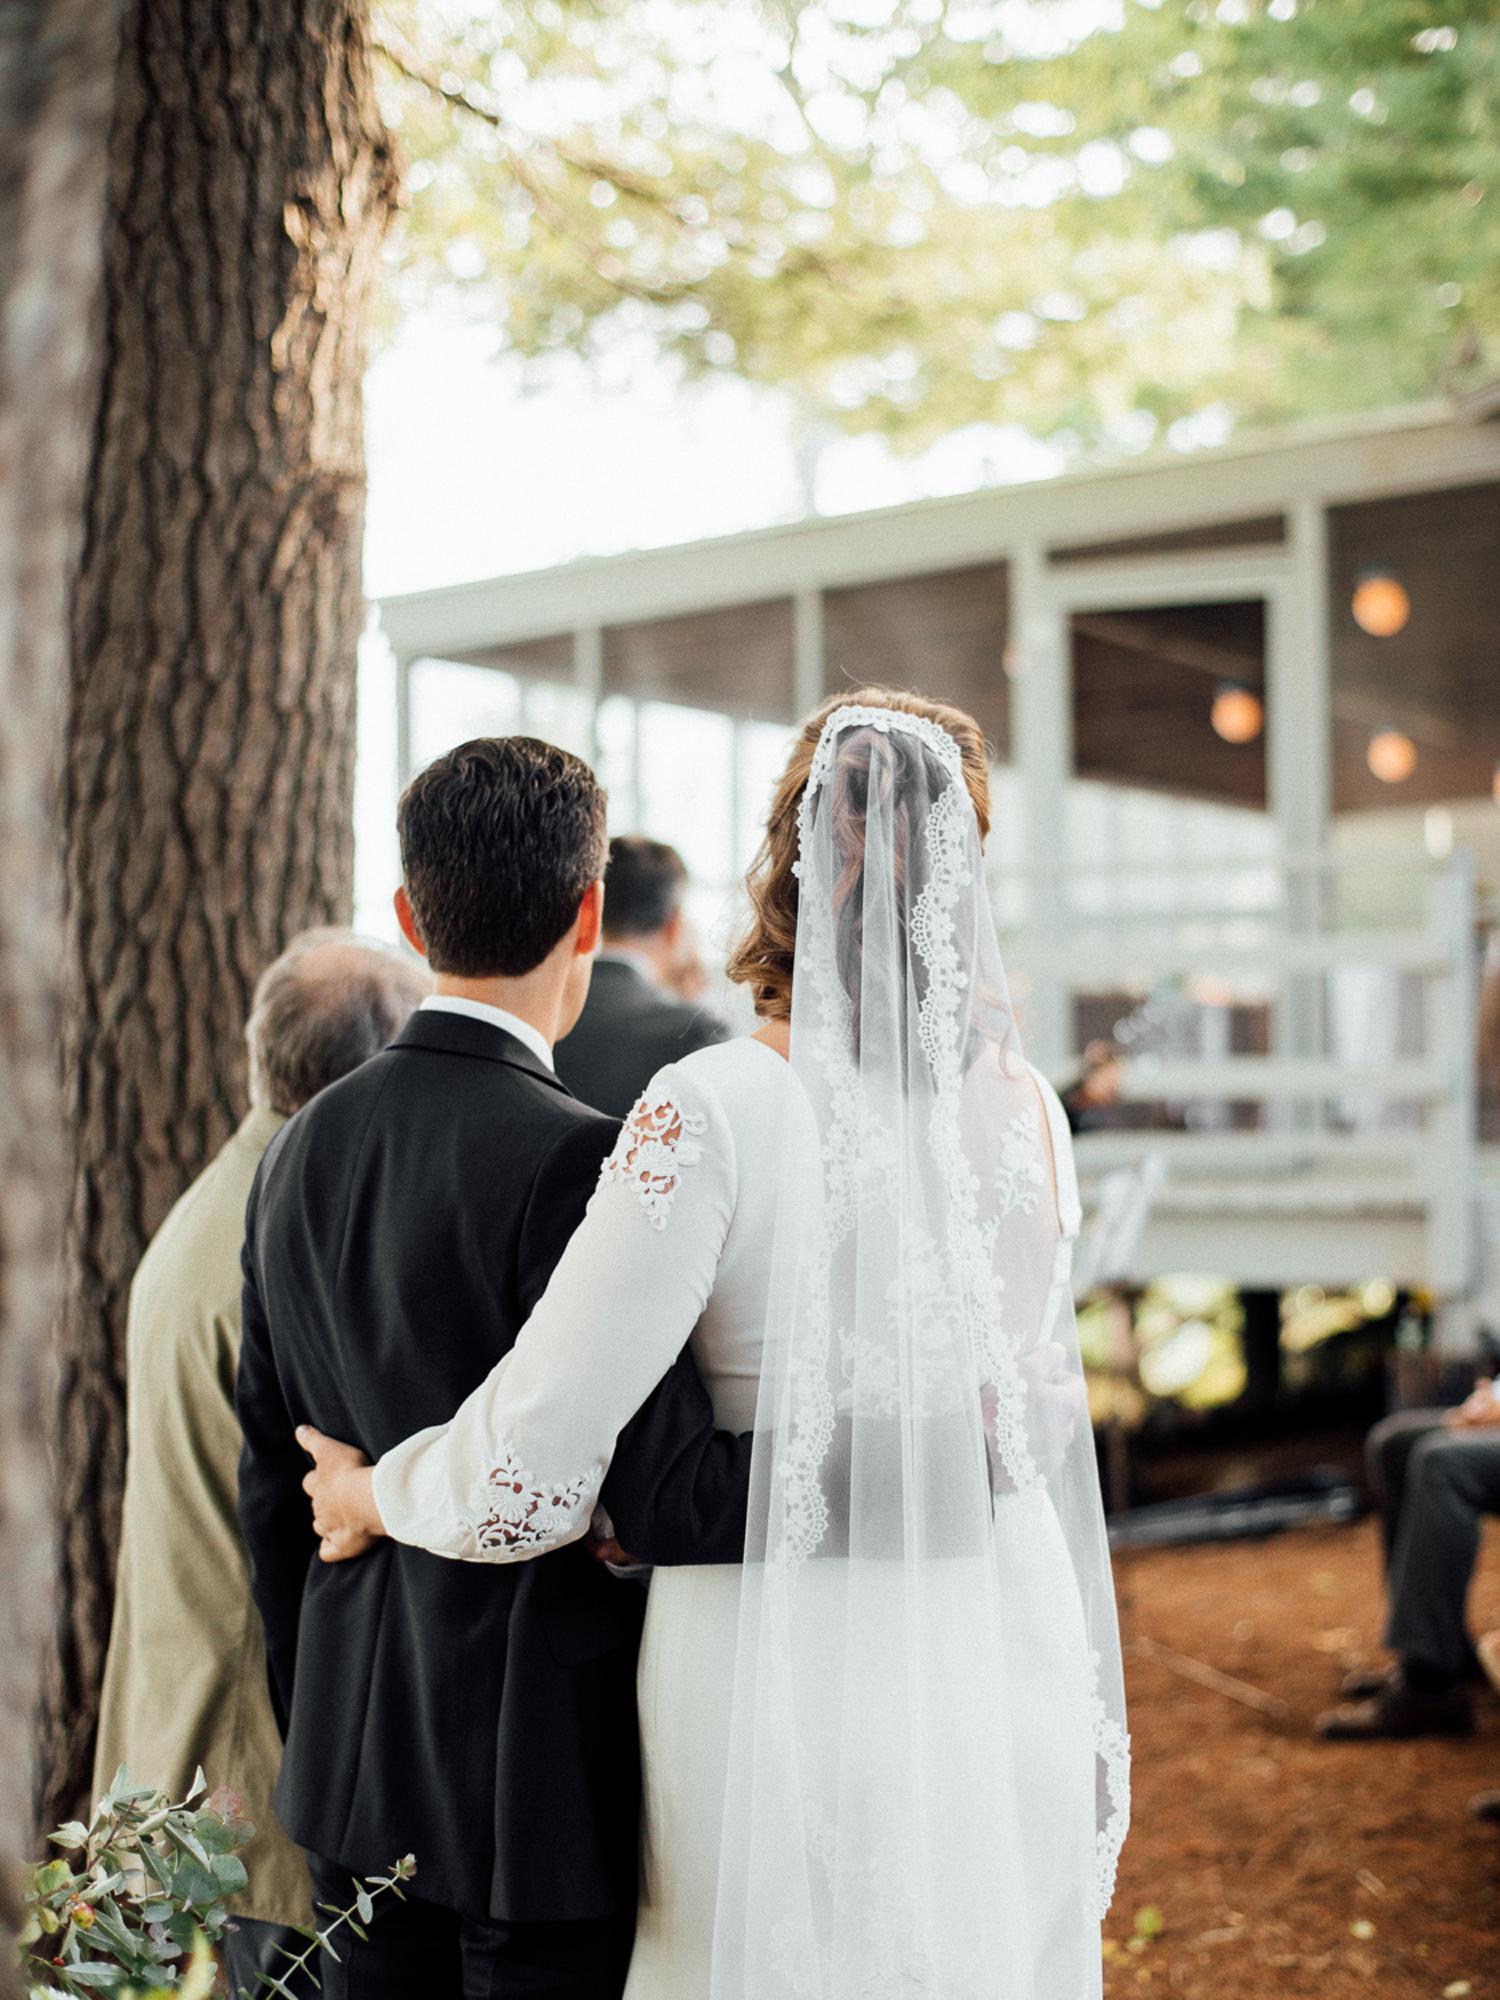 040-siousca-maineweddingphotographer-backyardwedding-mainewedding.jpg